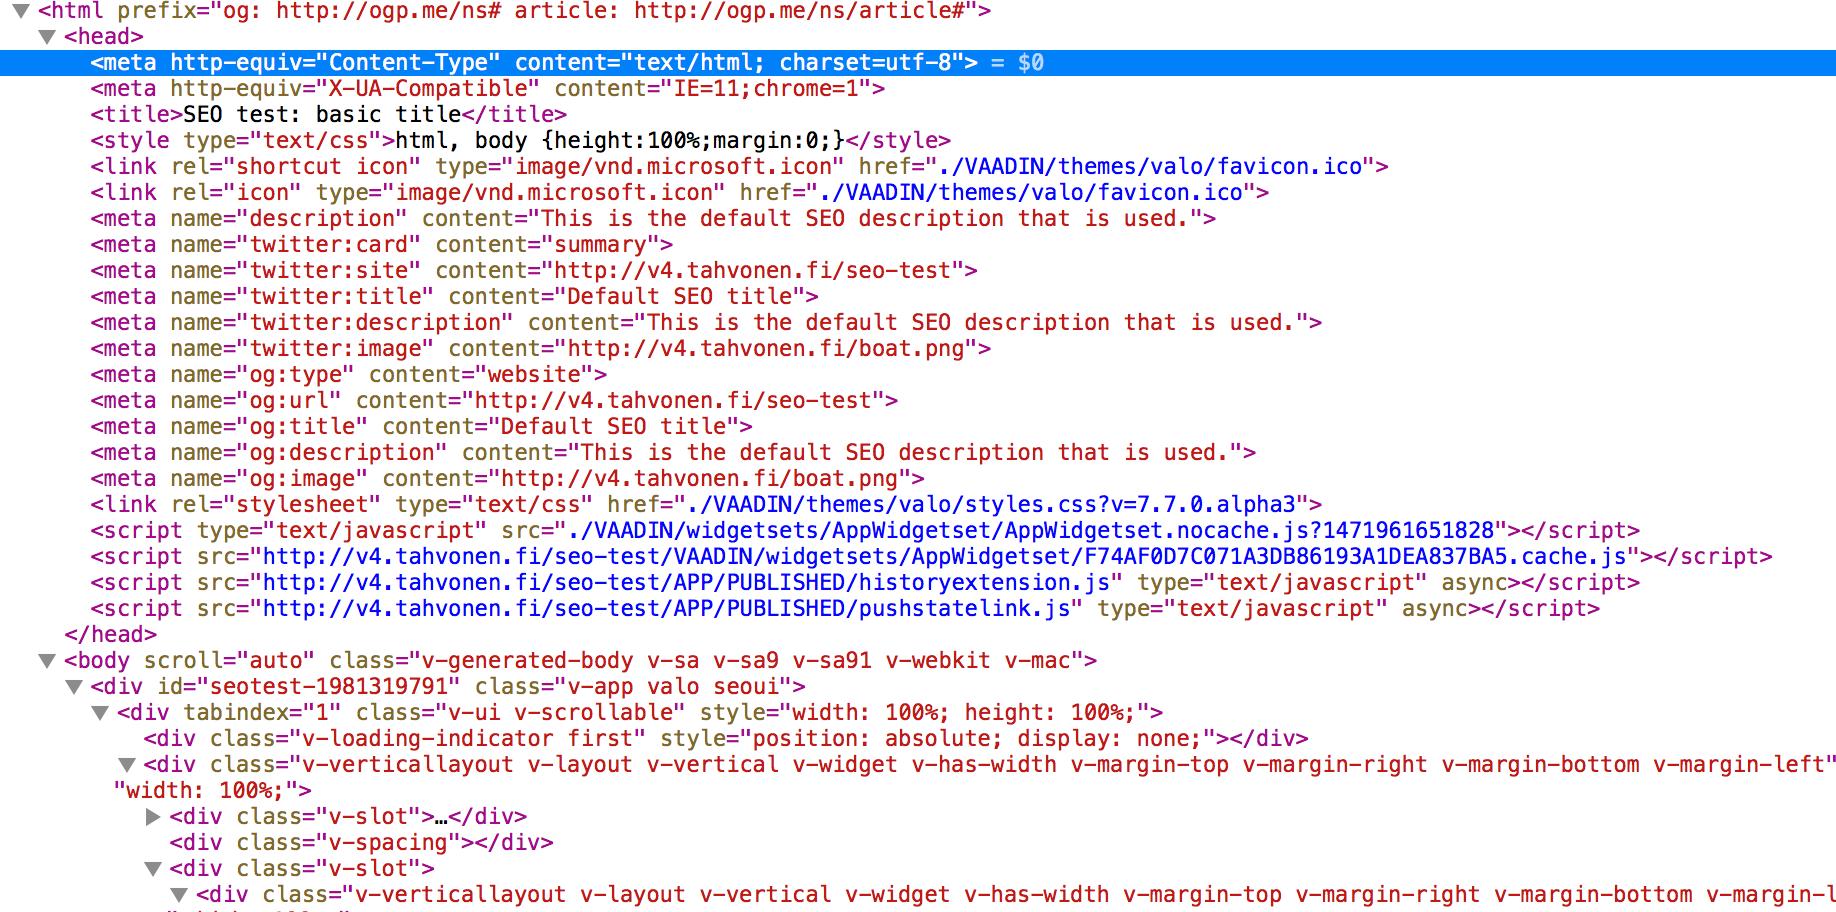 Meta tags generated by Volga